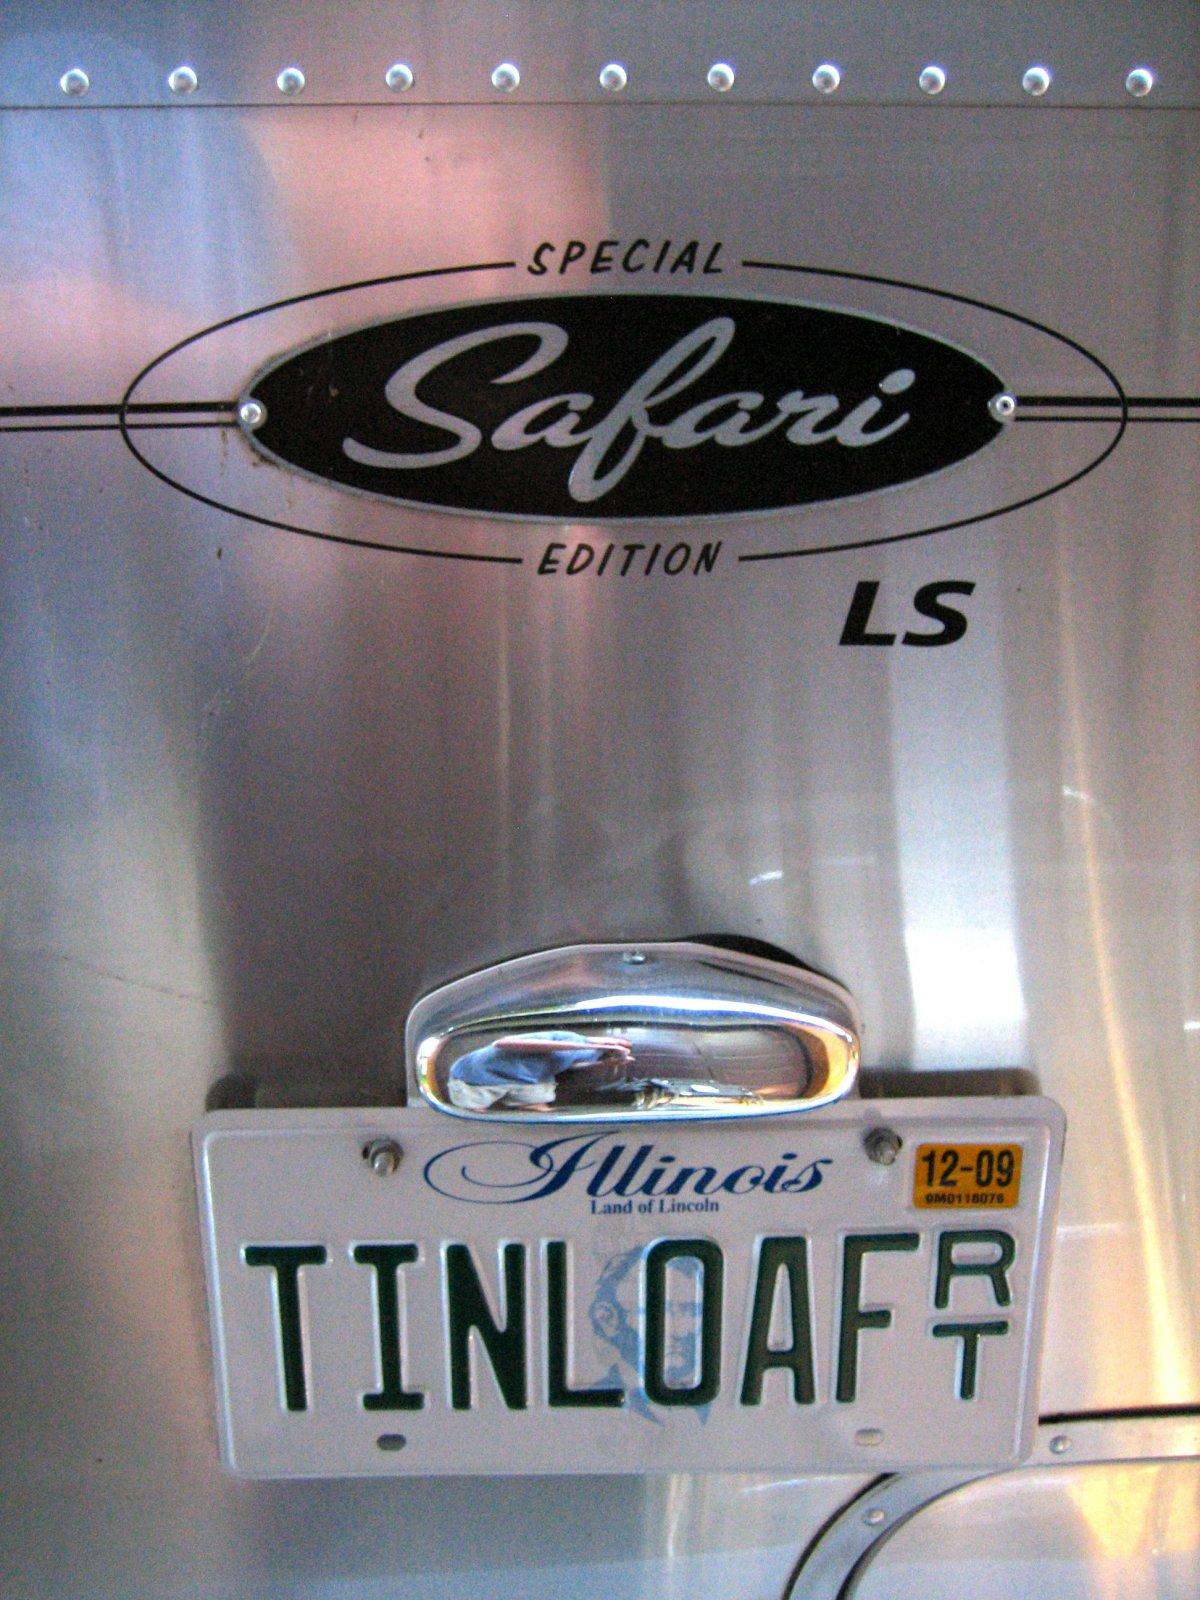 Click image for larger version  Name:tinloaf.jpg Views:133 Size:333.7 KB ID:83605